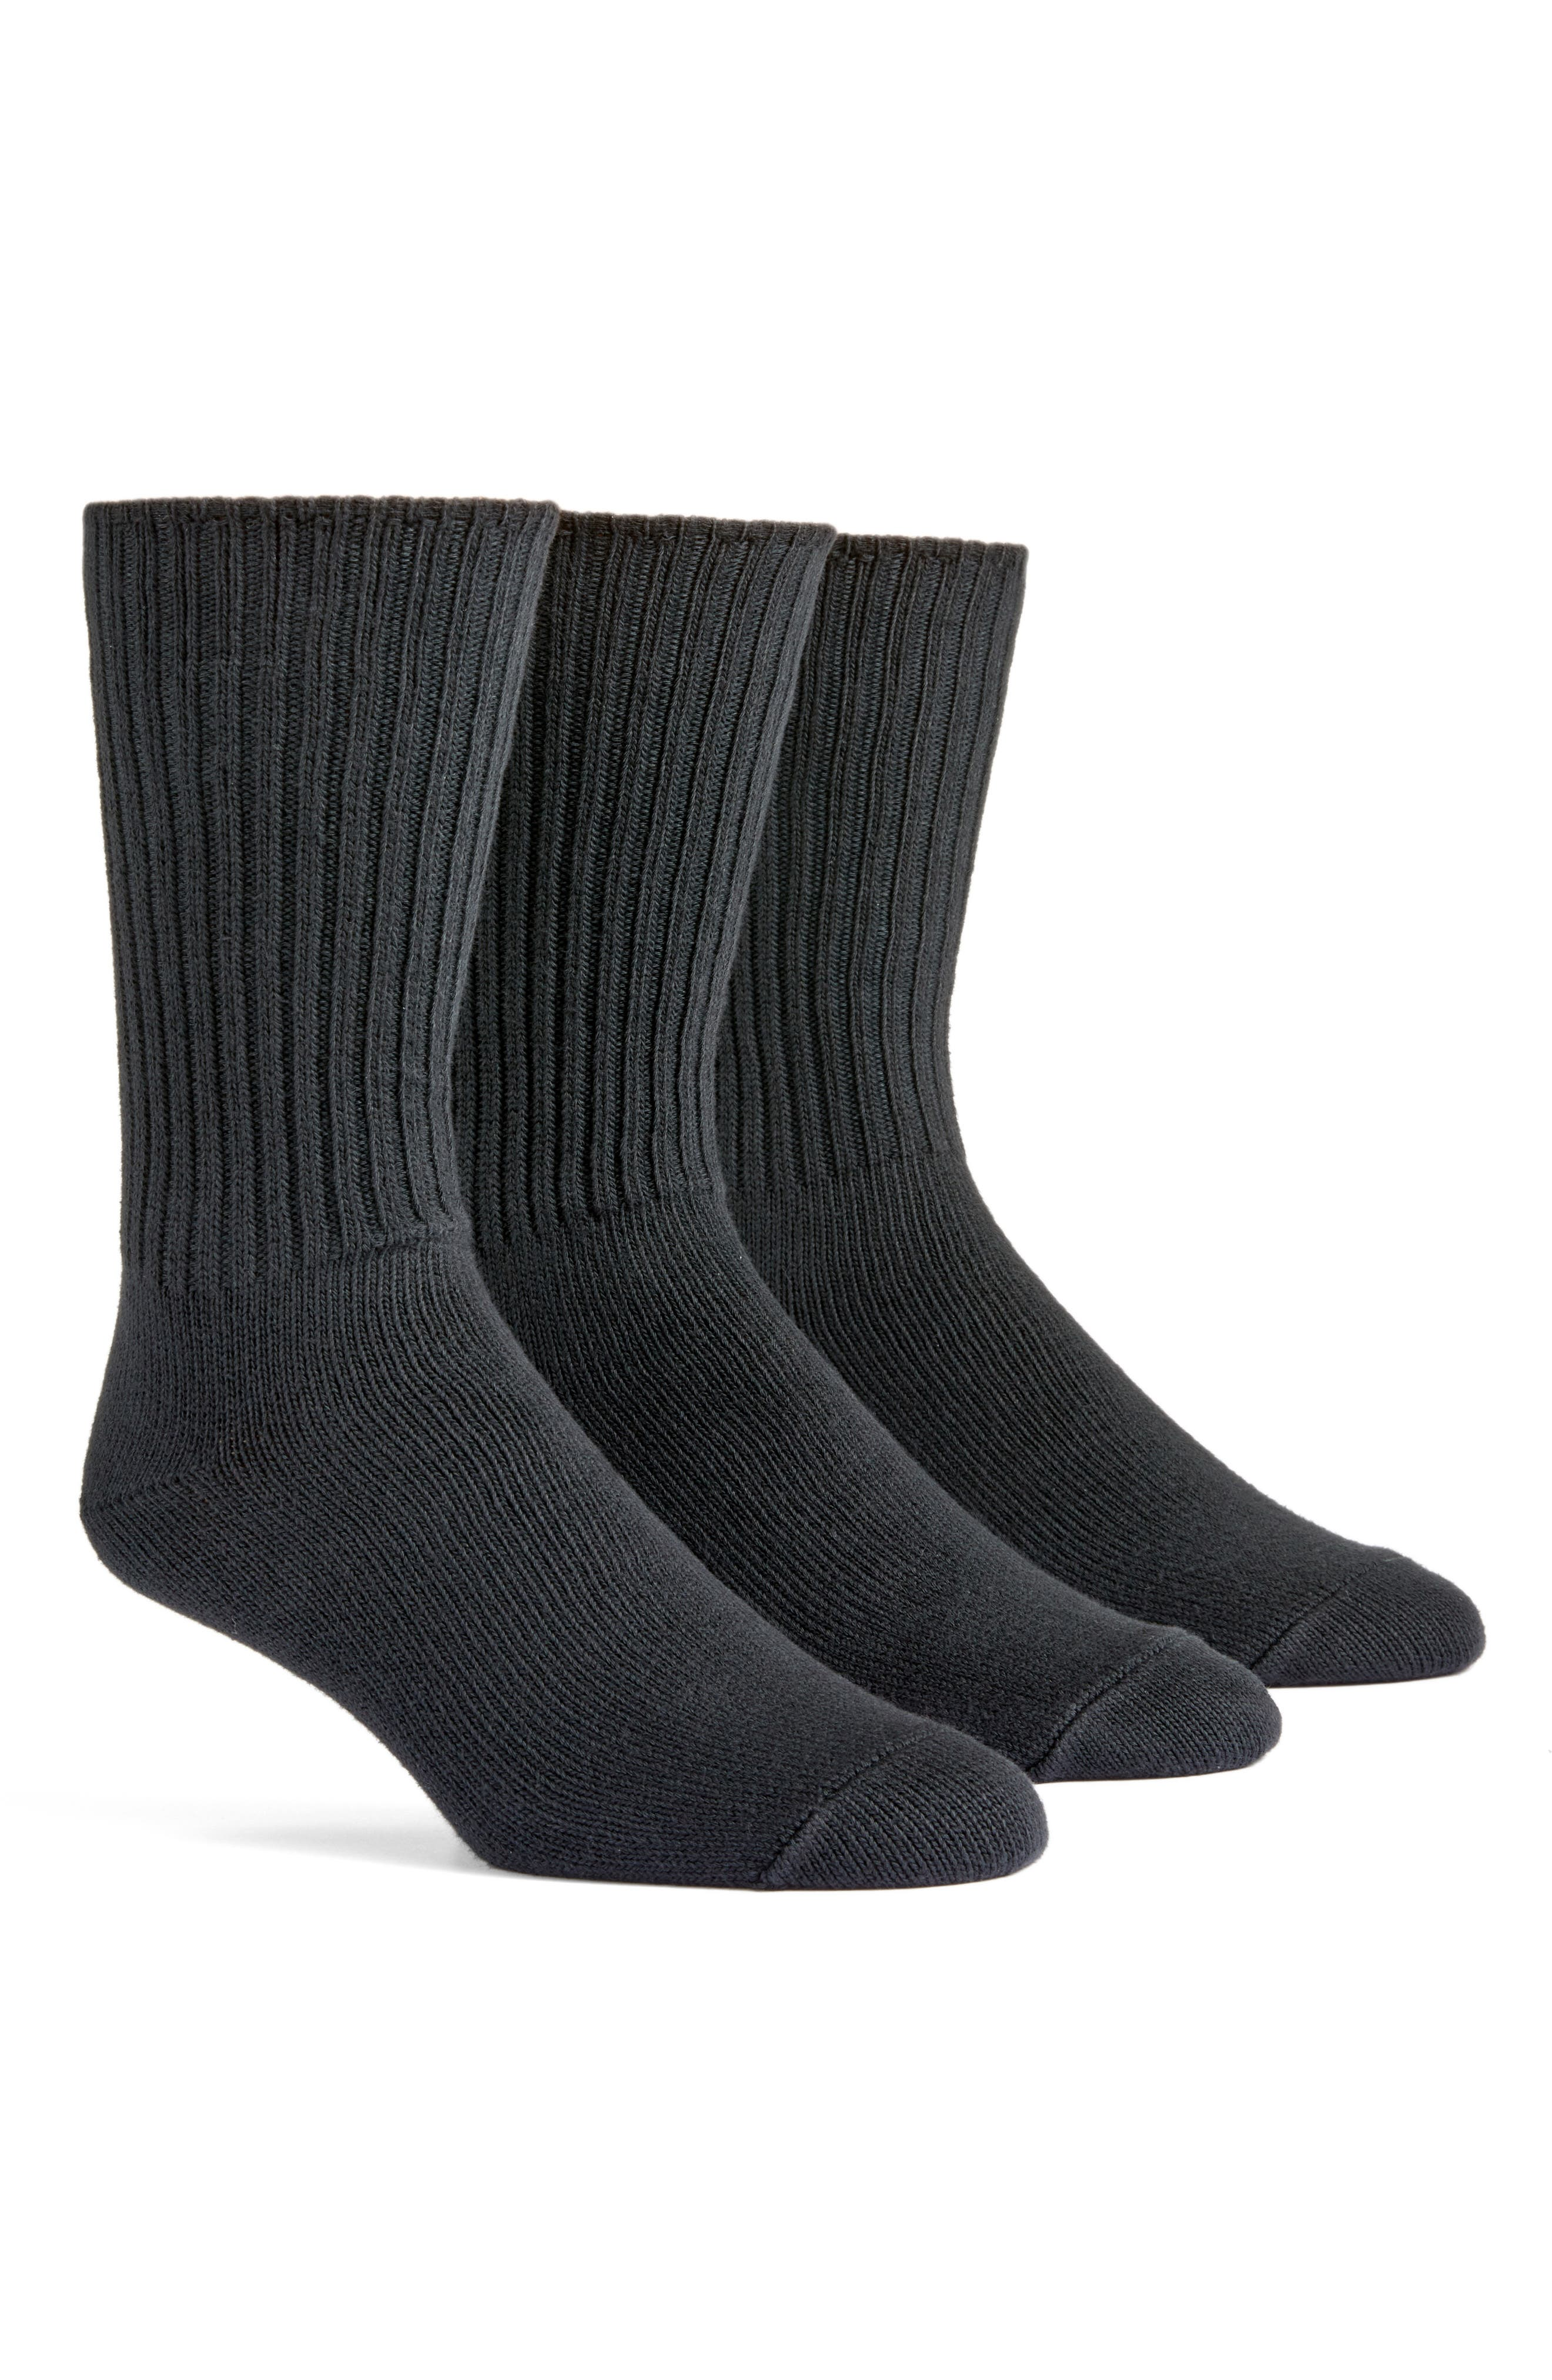 3-Pack Organic Cotton Blend Crew Socks